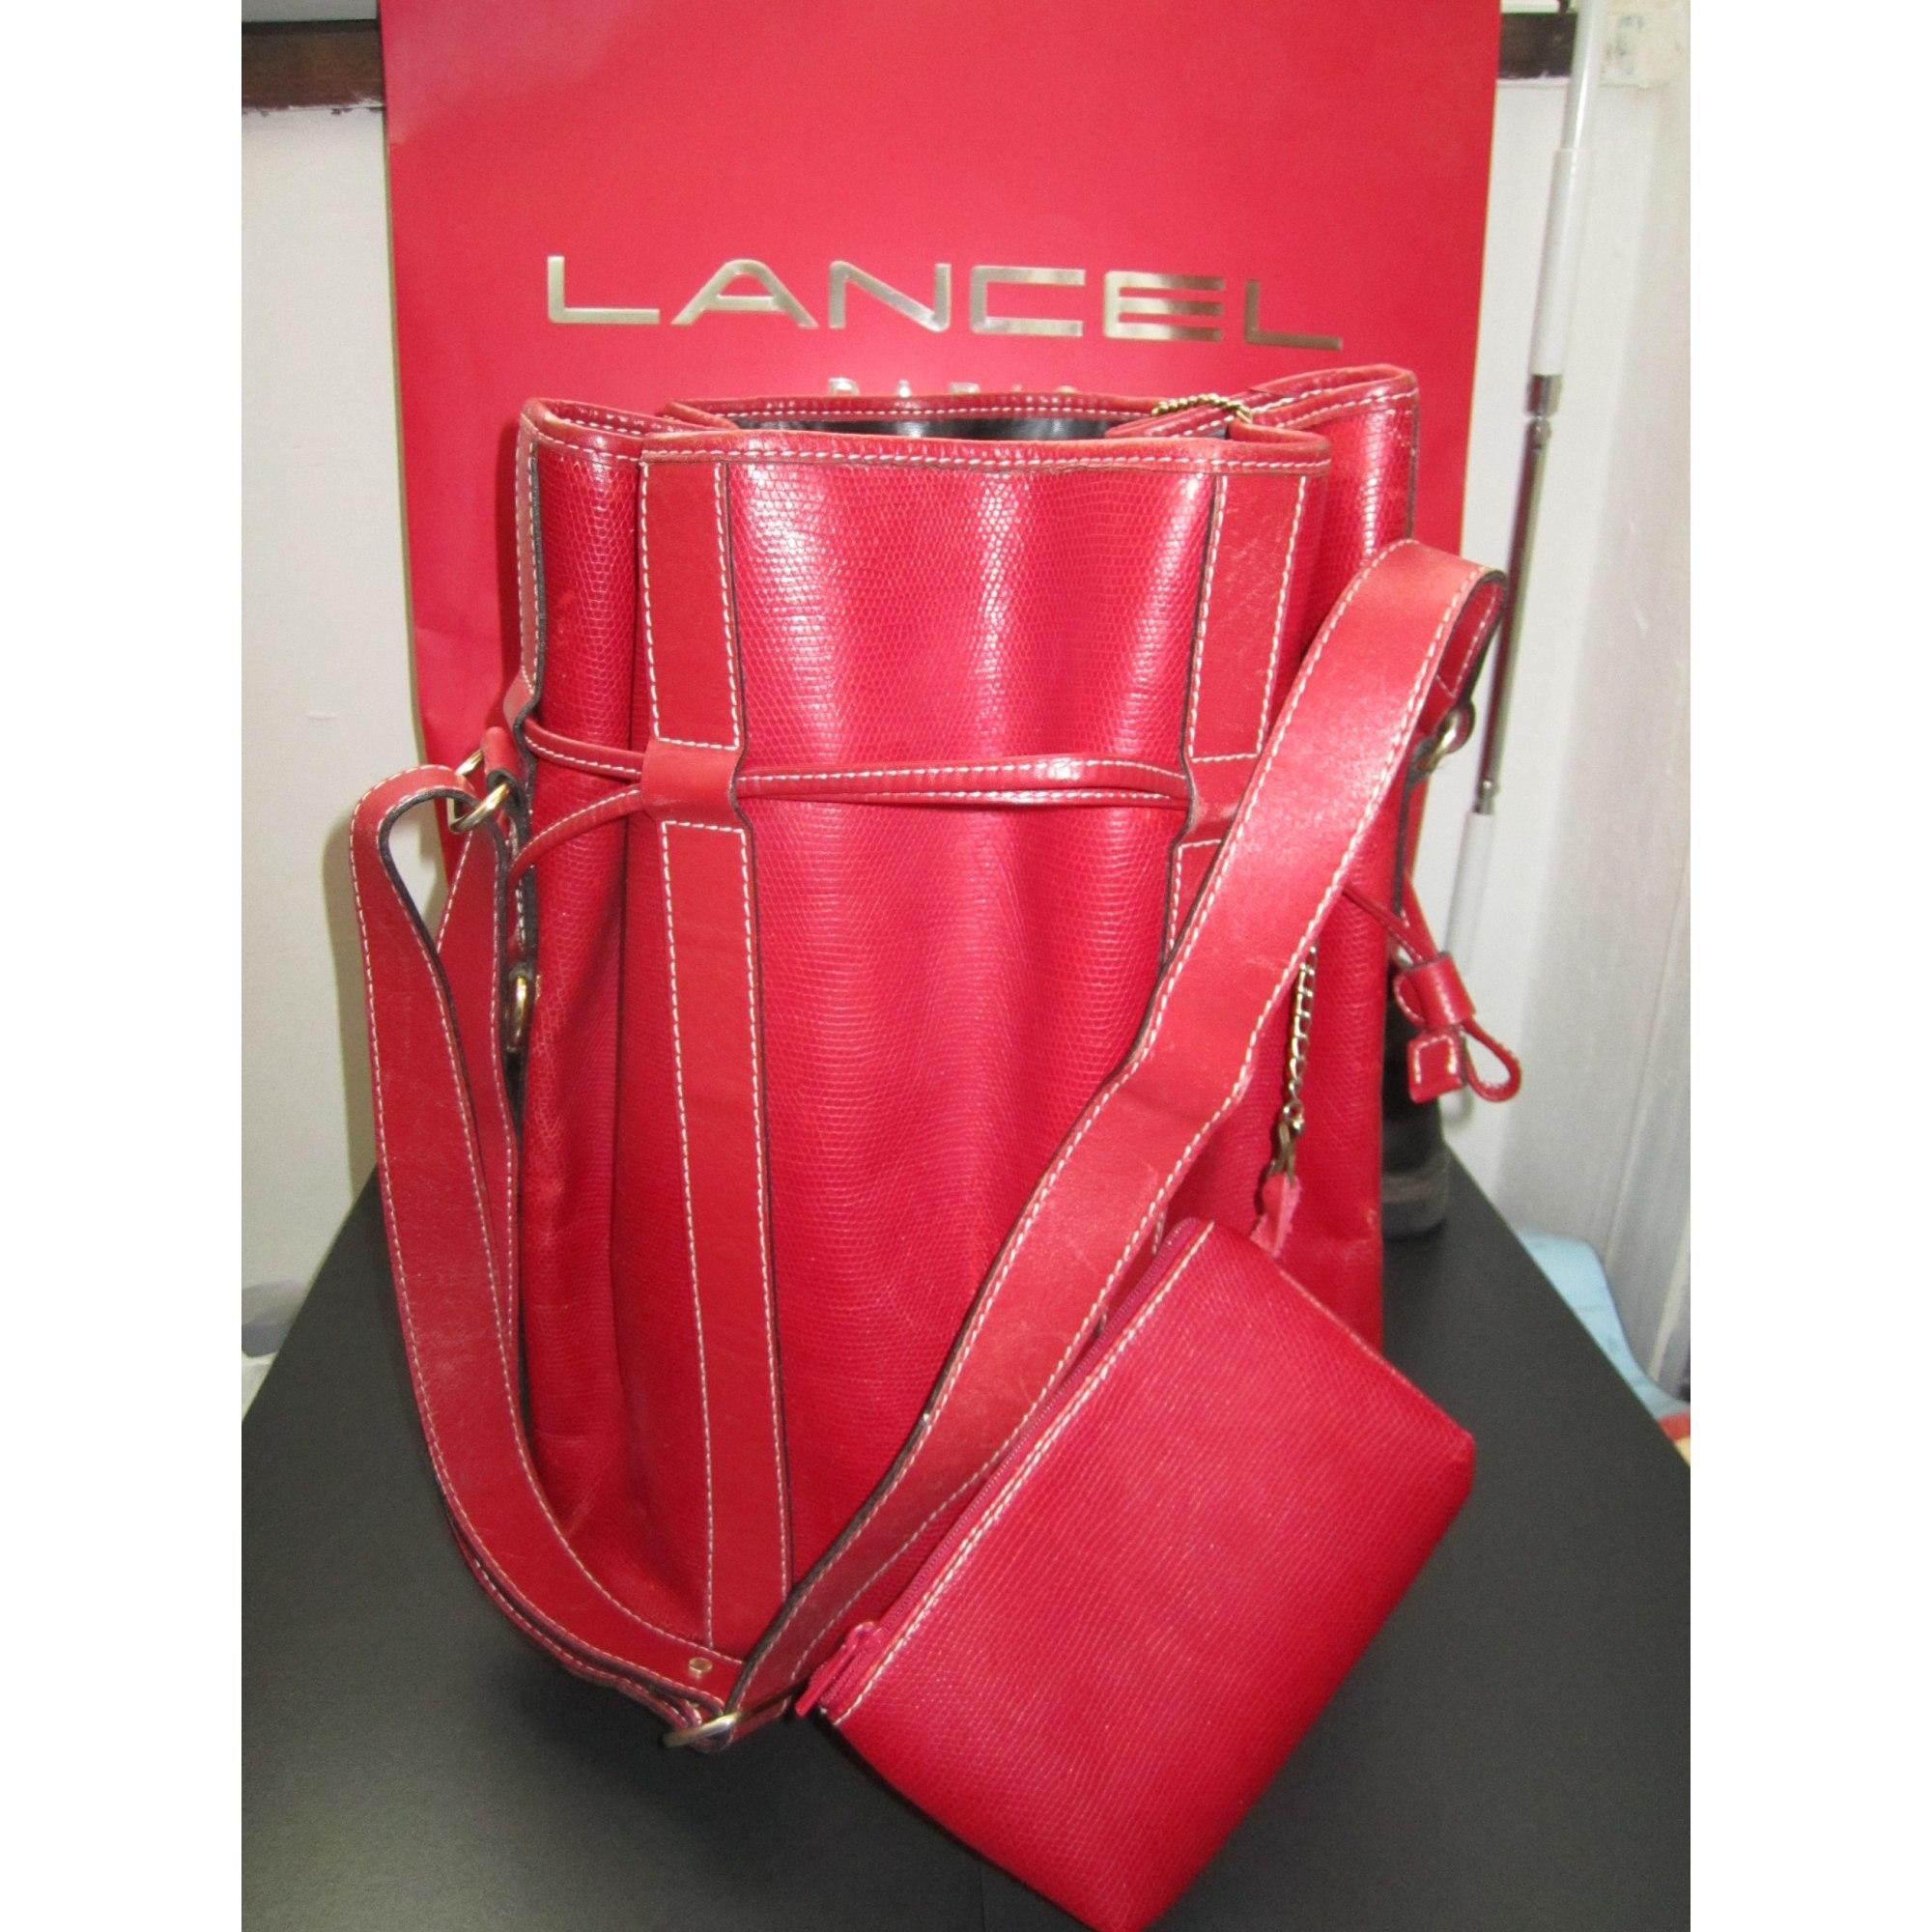 6b76133af49 Sac en bandoulière en cuir LANCEL rouge - 1365856